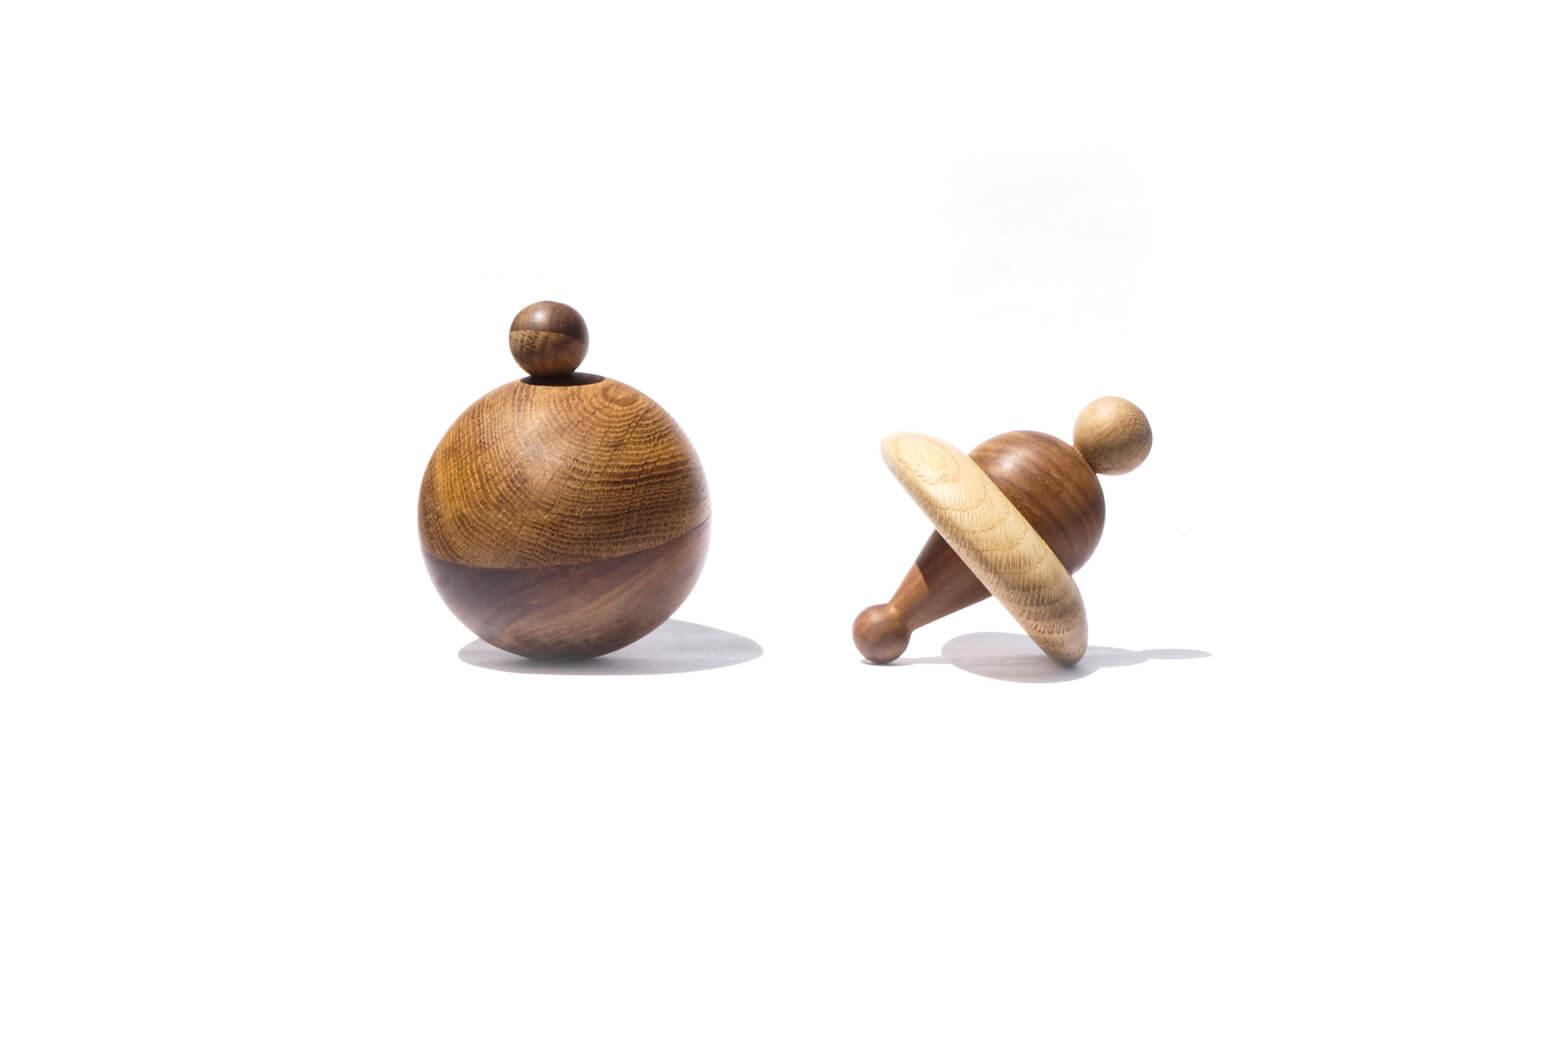 Spring Copenhagen Wooden Toys/スプリング コペンハーゲン 木のおもちゃ デンマーク 北欧雑貨